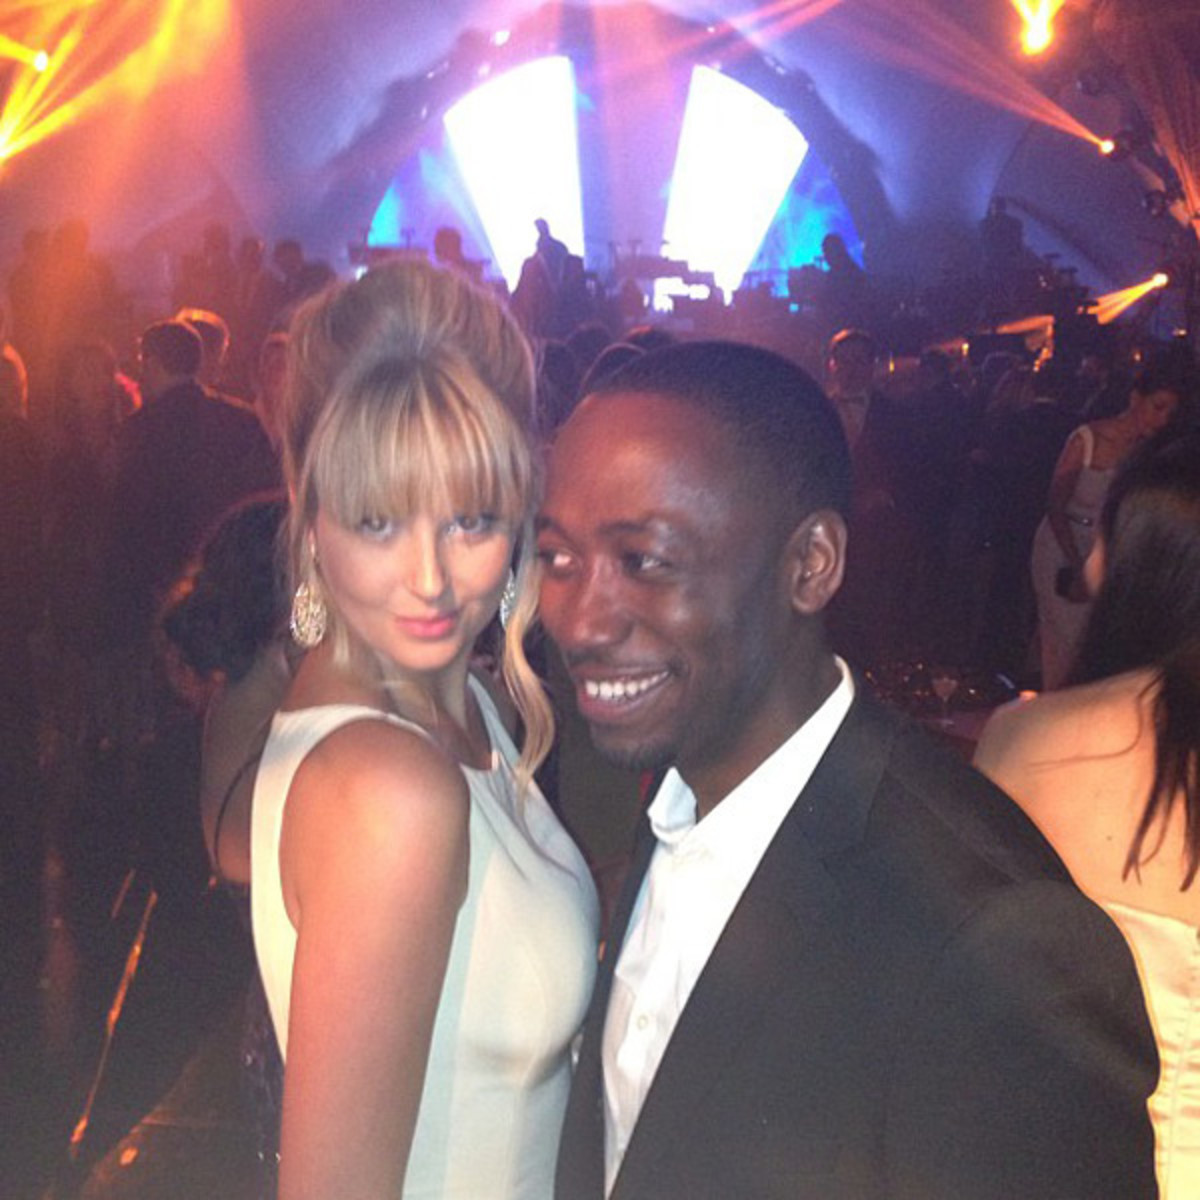 Genevieve Morton and Lamorne Morris :: @genevievemorton